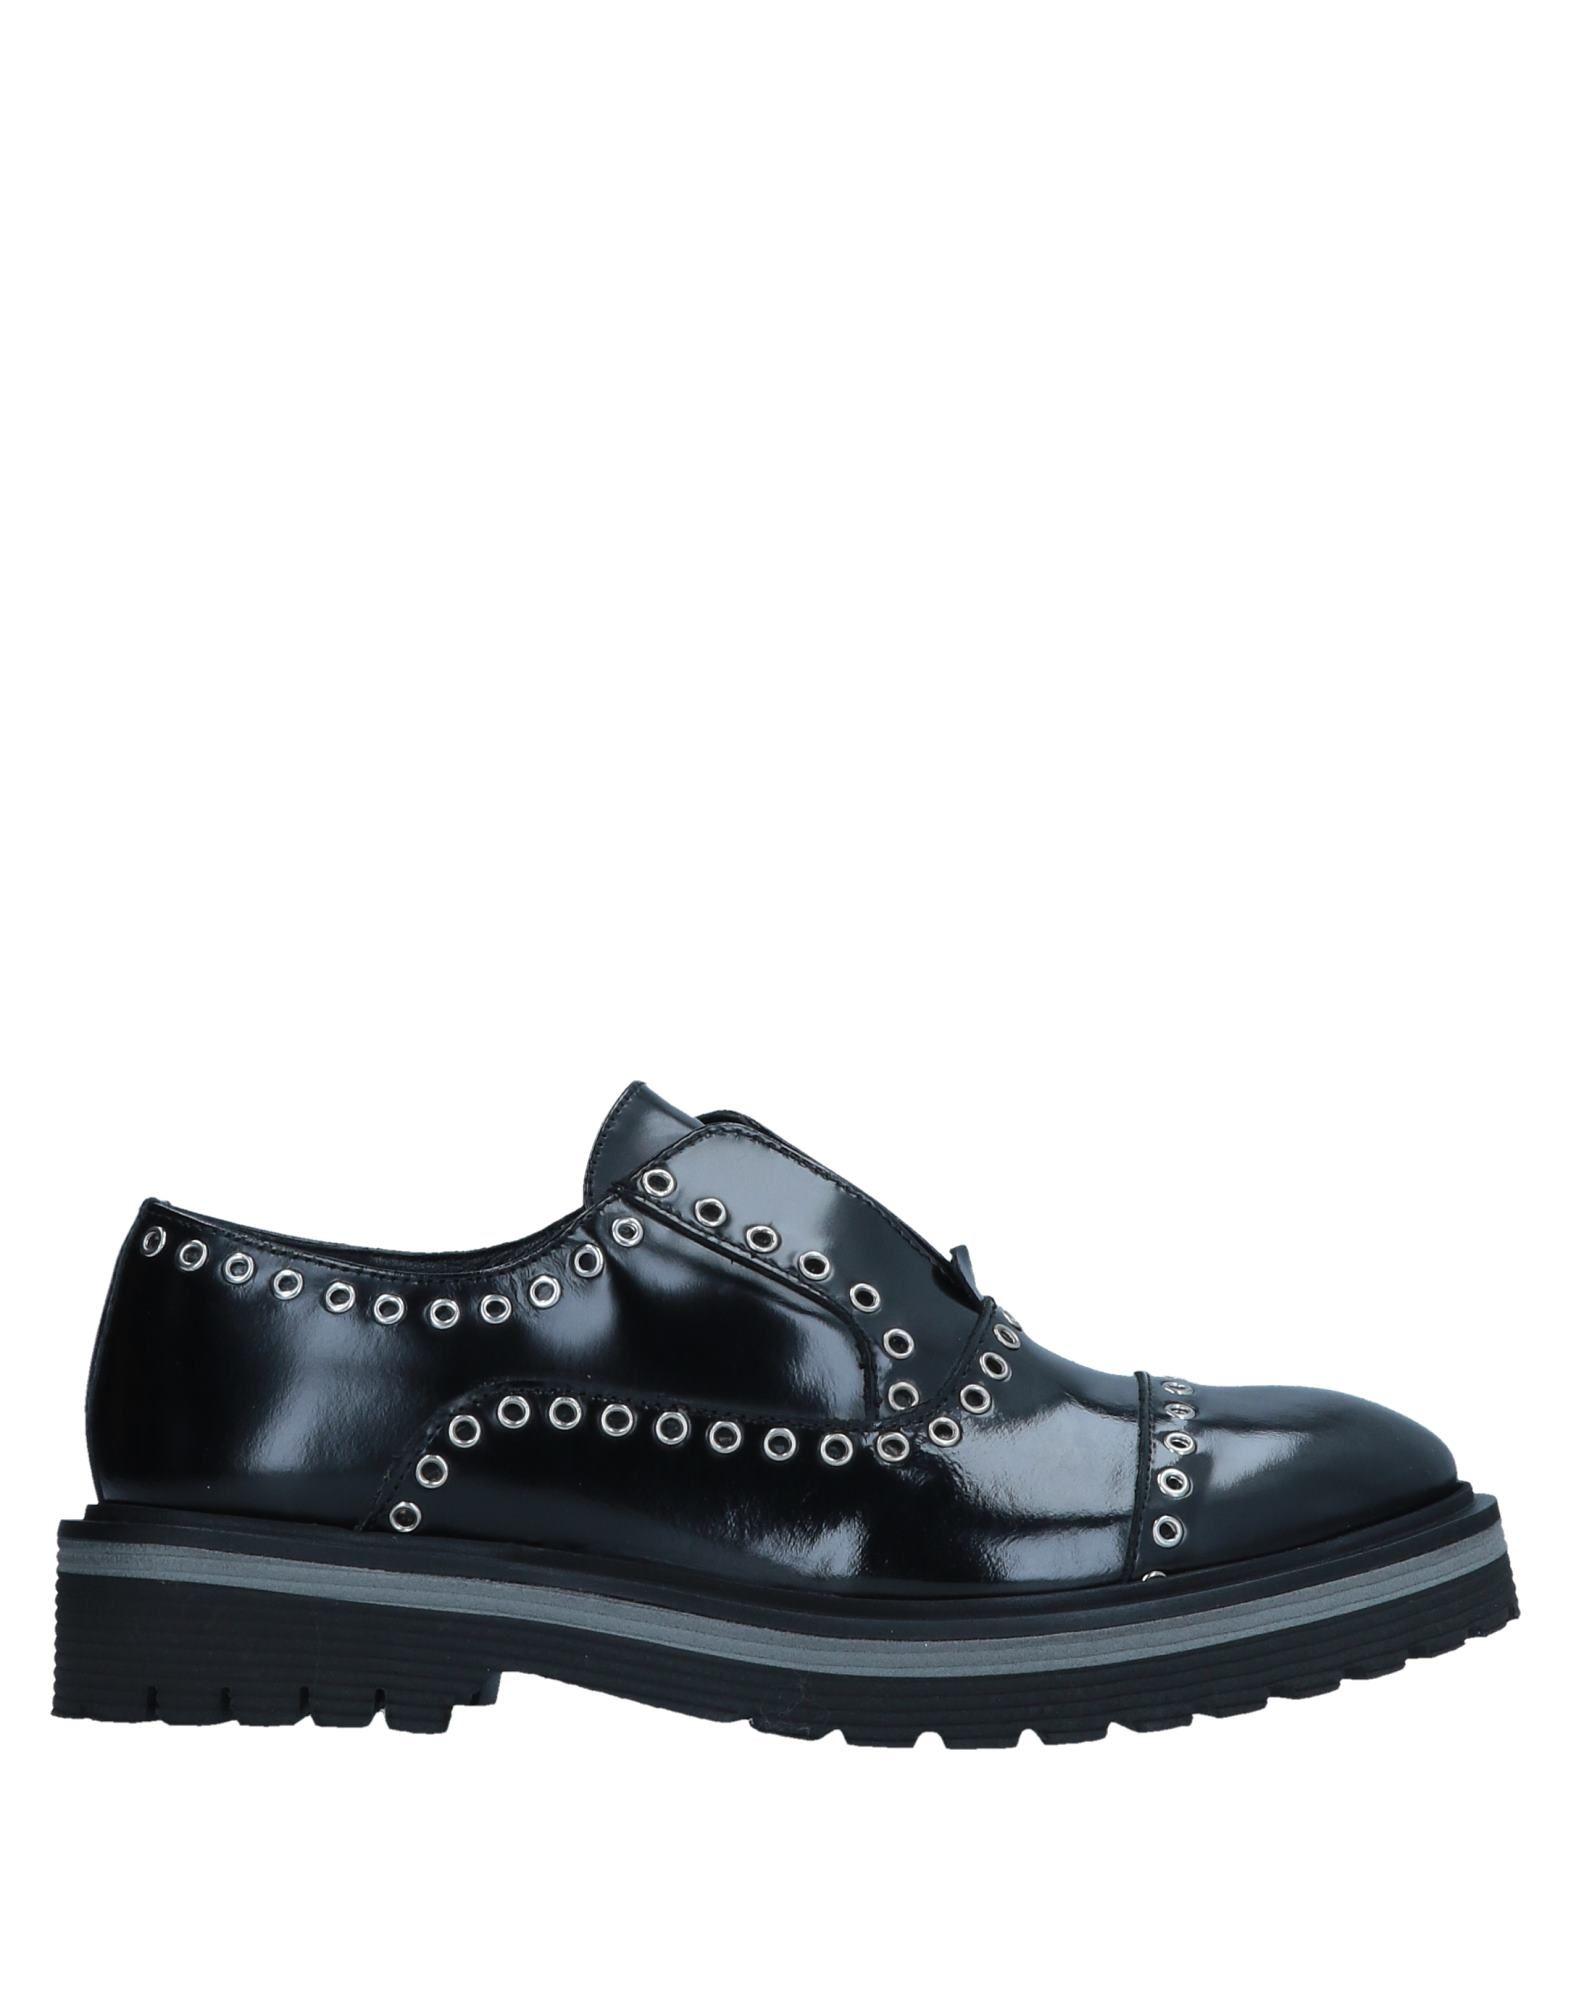 Stilvolle billige Schuhe  Victoria Wood Mokassins Damen  Schuhe 11548048UD 98c0d4